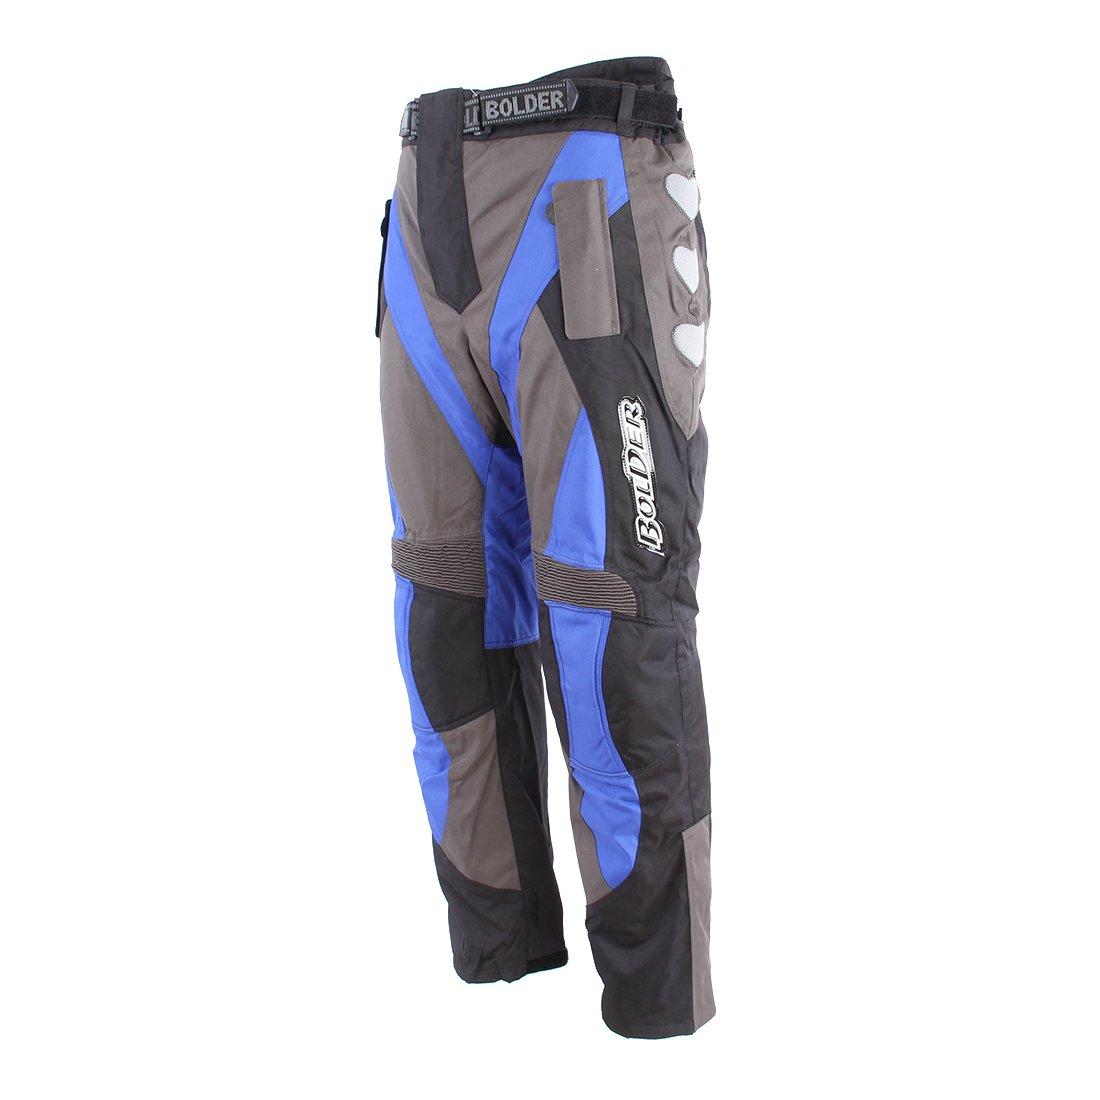 Bolder 2066 Enduro šedo-modré L